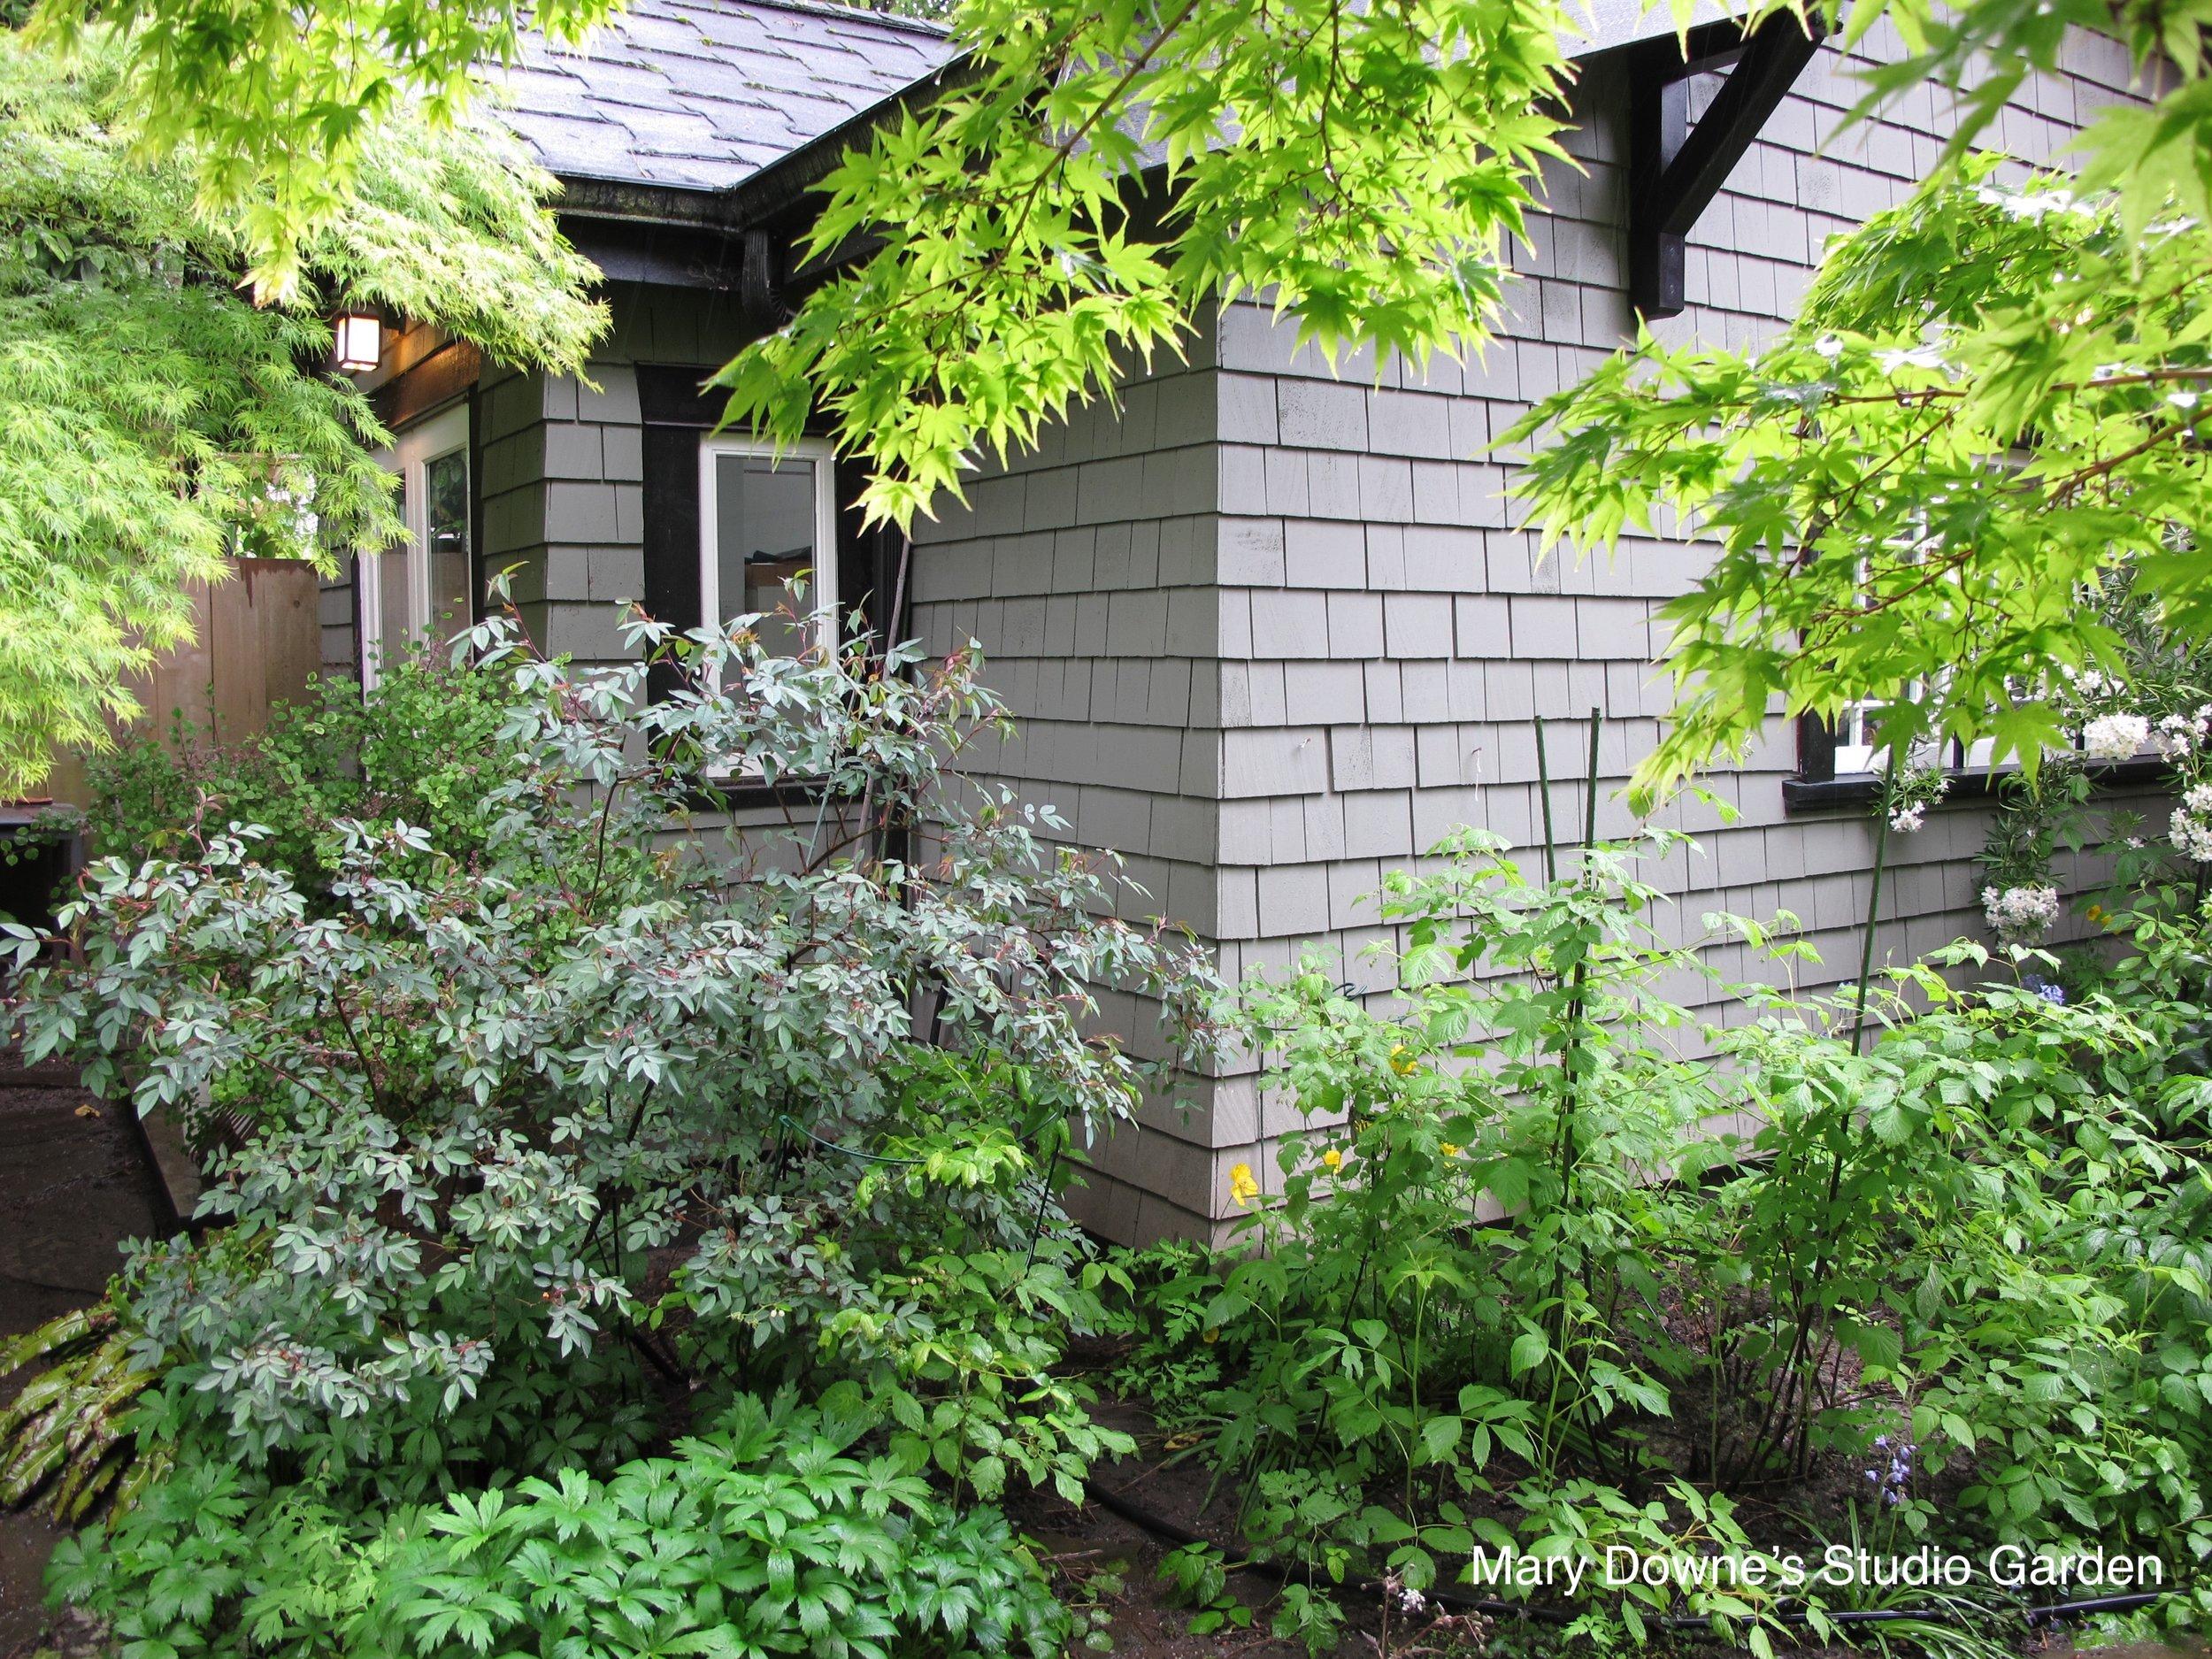 Mary Downe's studio garden.jpg